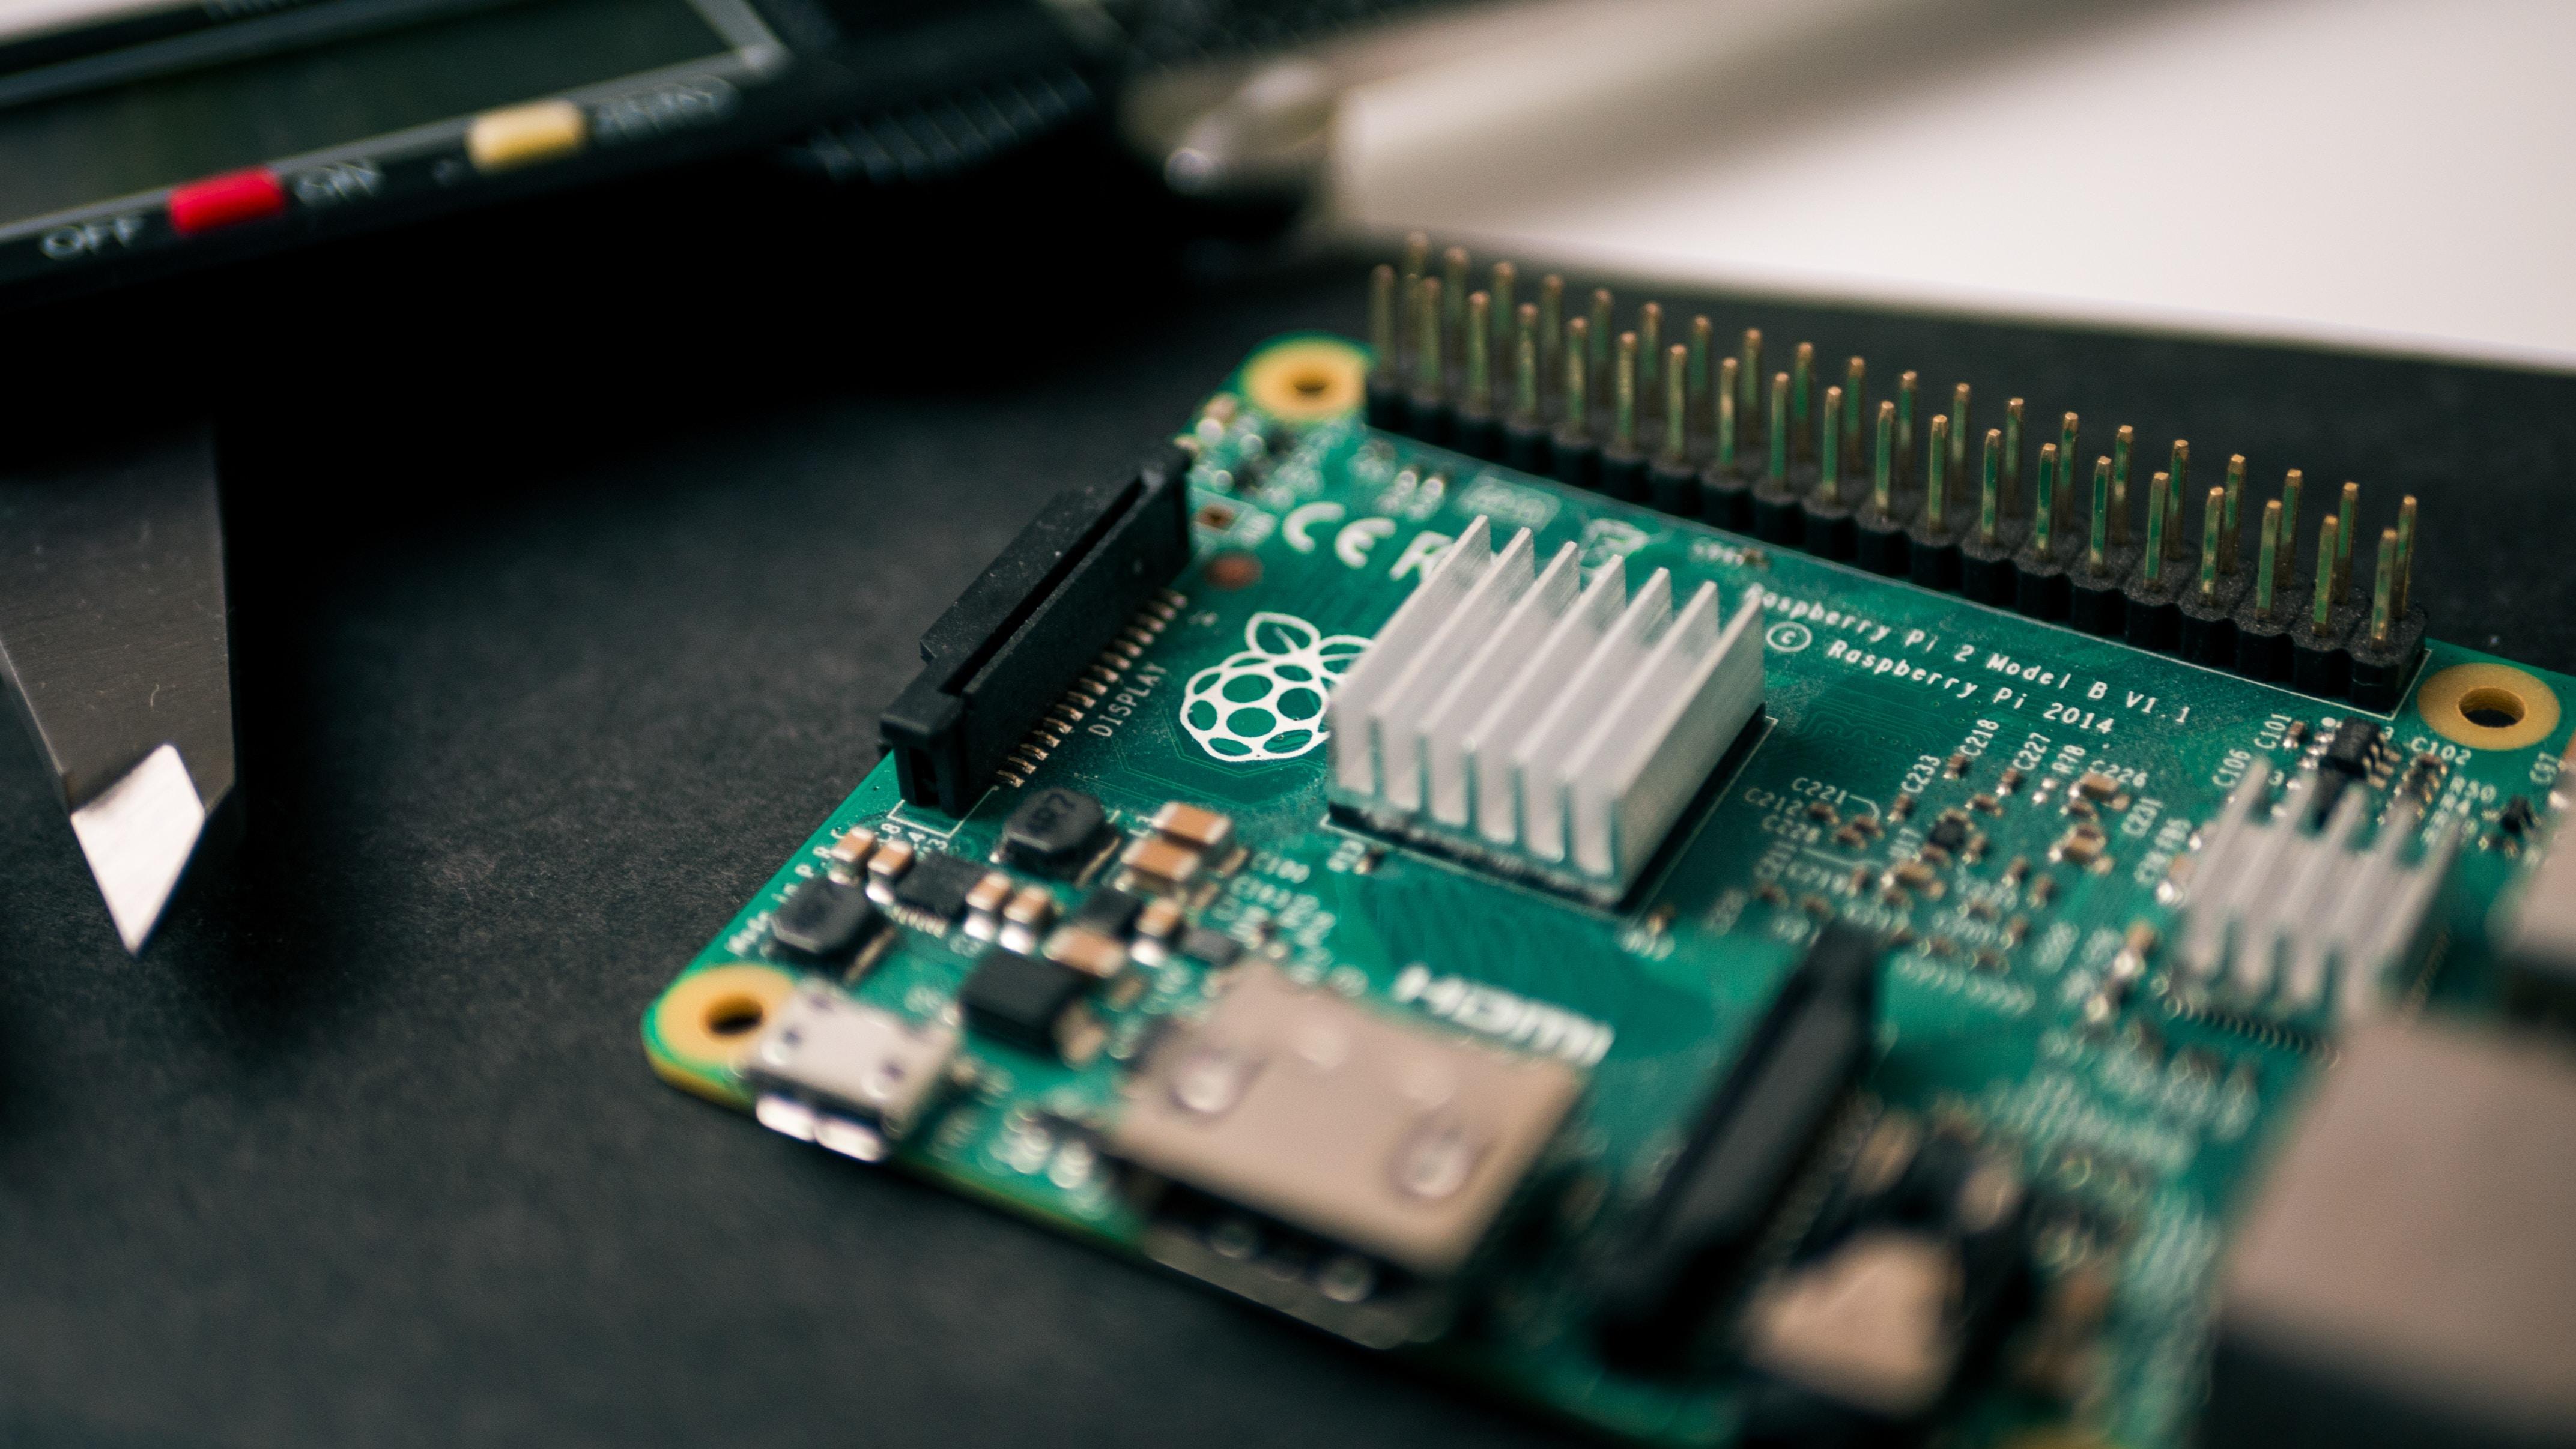 Alternatieve besturingsstemen Raspberry Pi